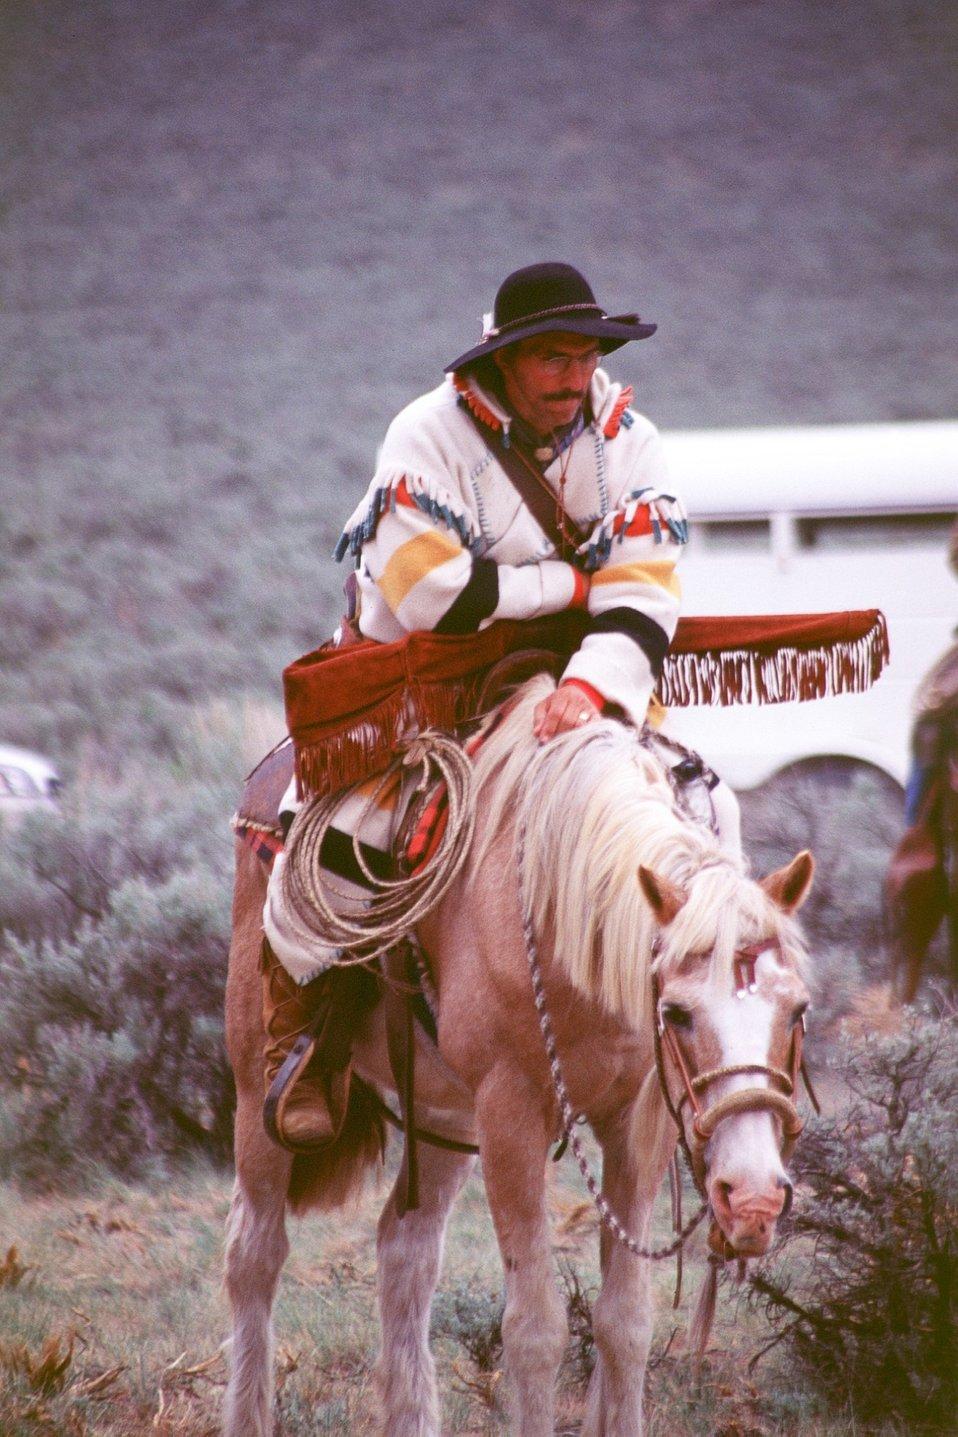 NHOTIC 10th Anniversary, wagon train reenactment. Pioneer scout on horseback.